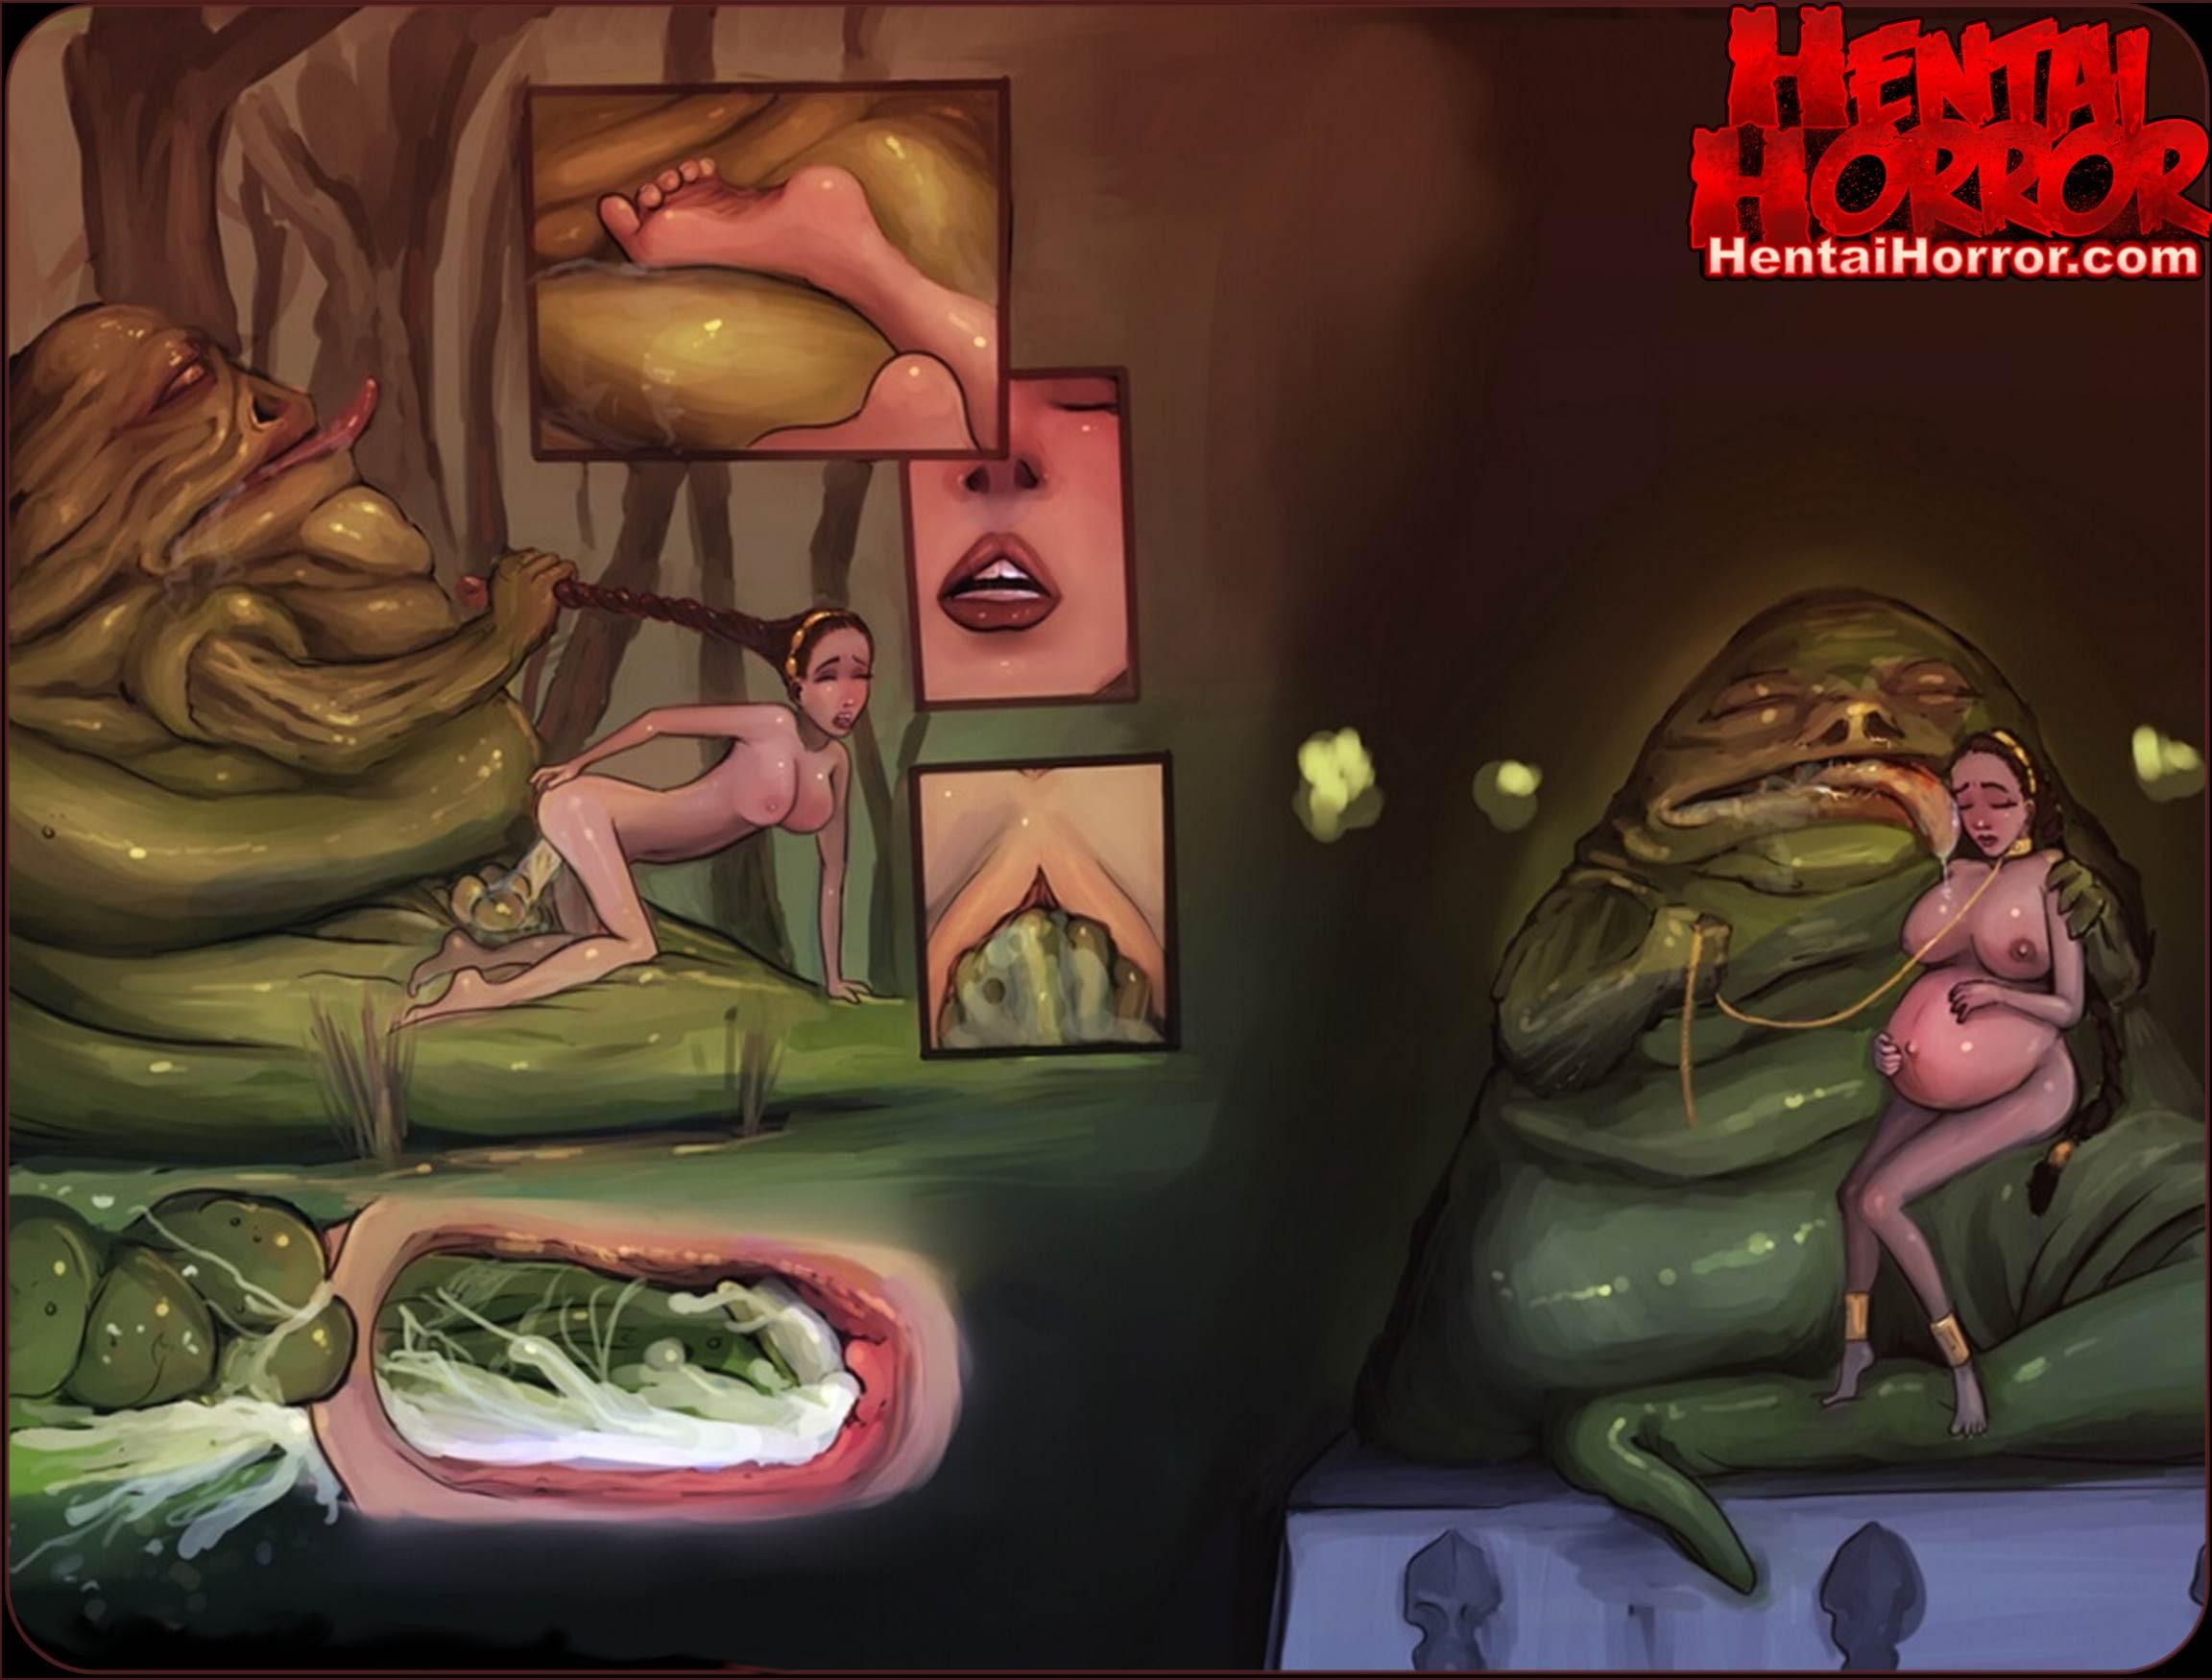 starwarsexxxx hentaihorror princessleiajabbathehutt cartoonporn pregopregnant